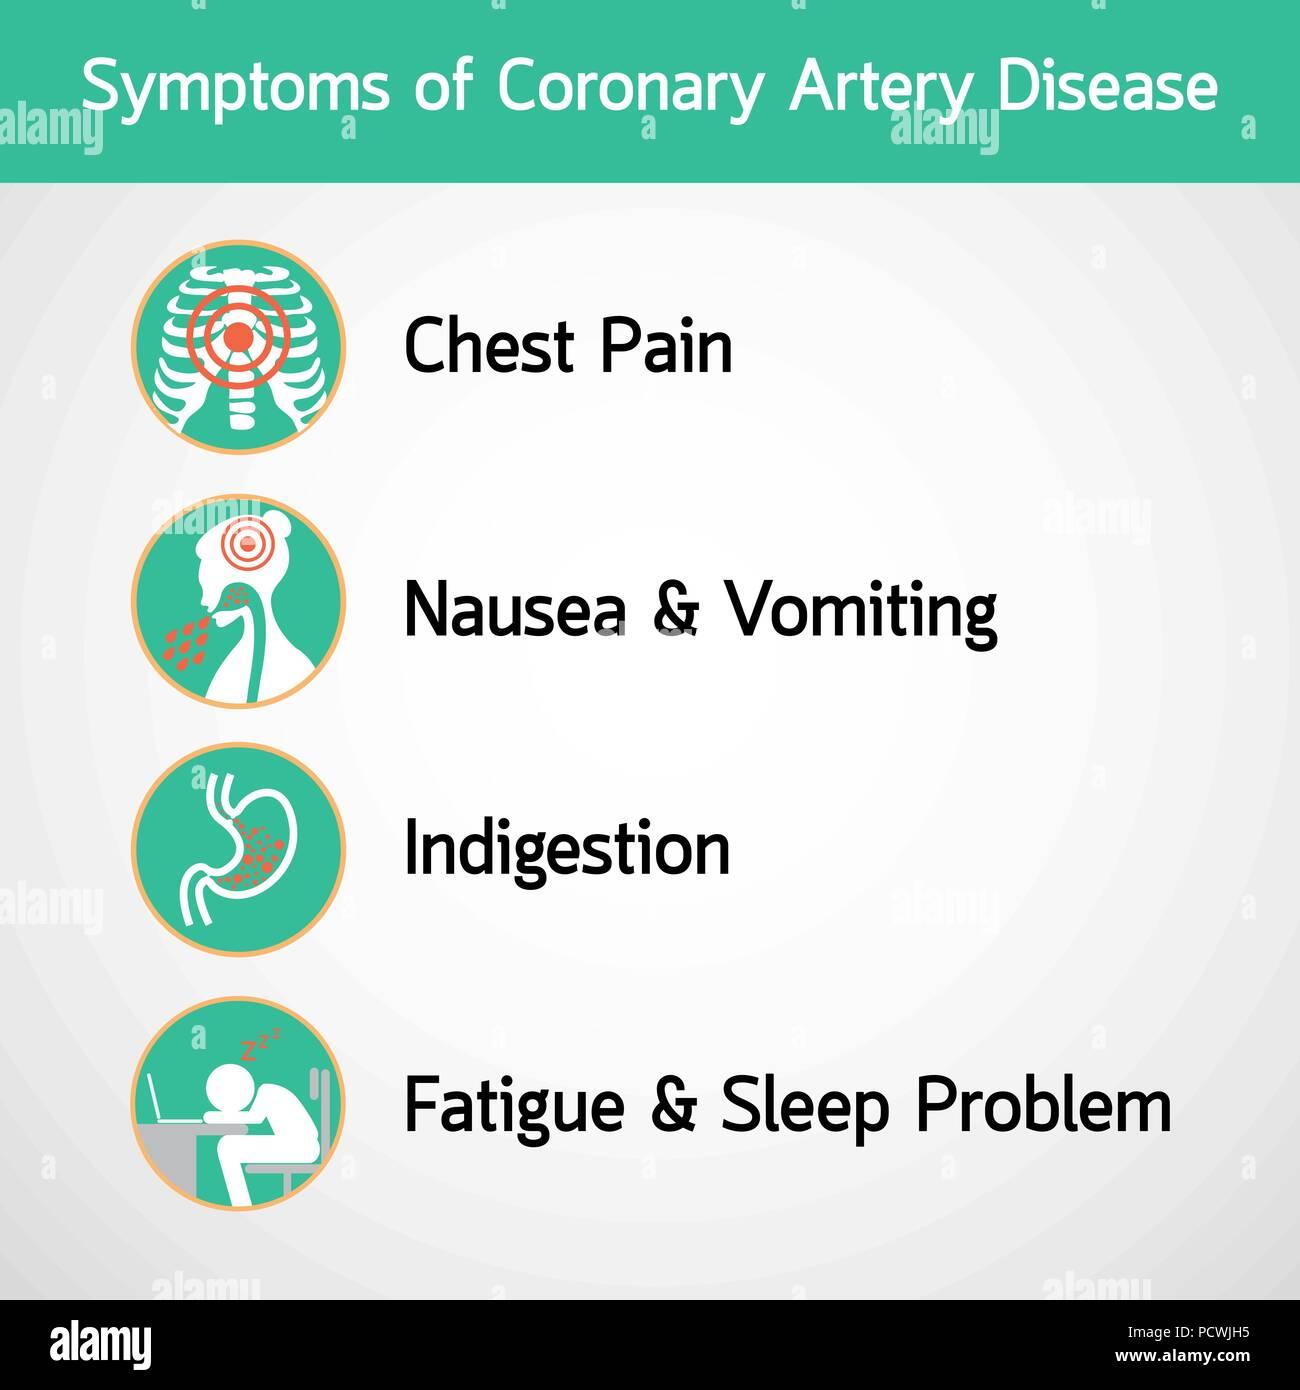 Symptoms of Coronary Artery Disease vector logo icon illustration - Stock Image